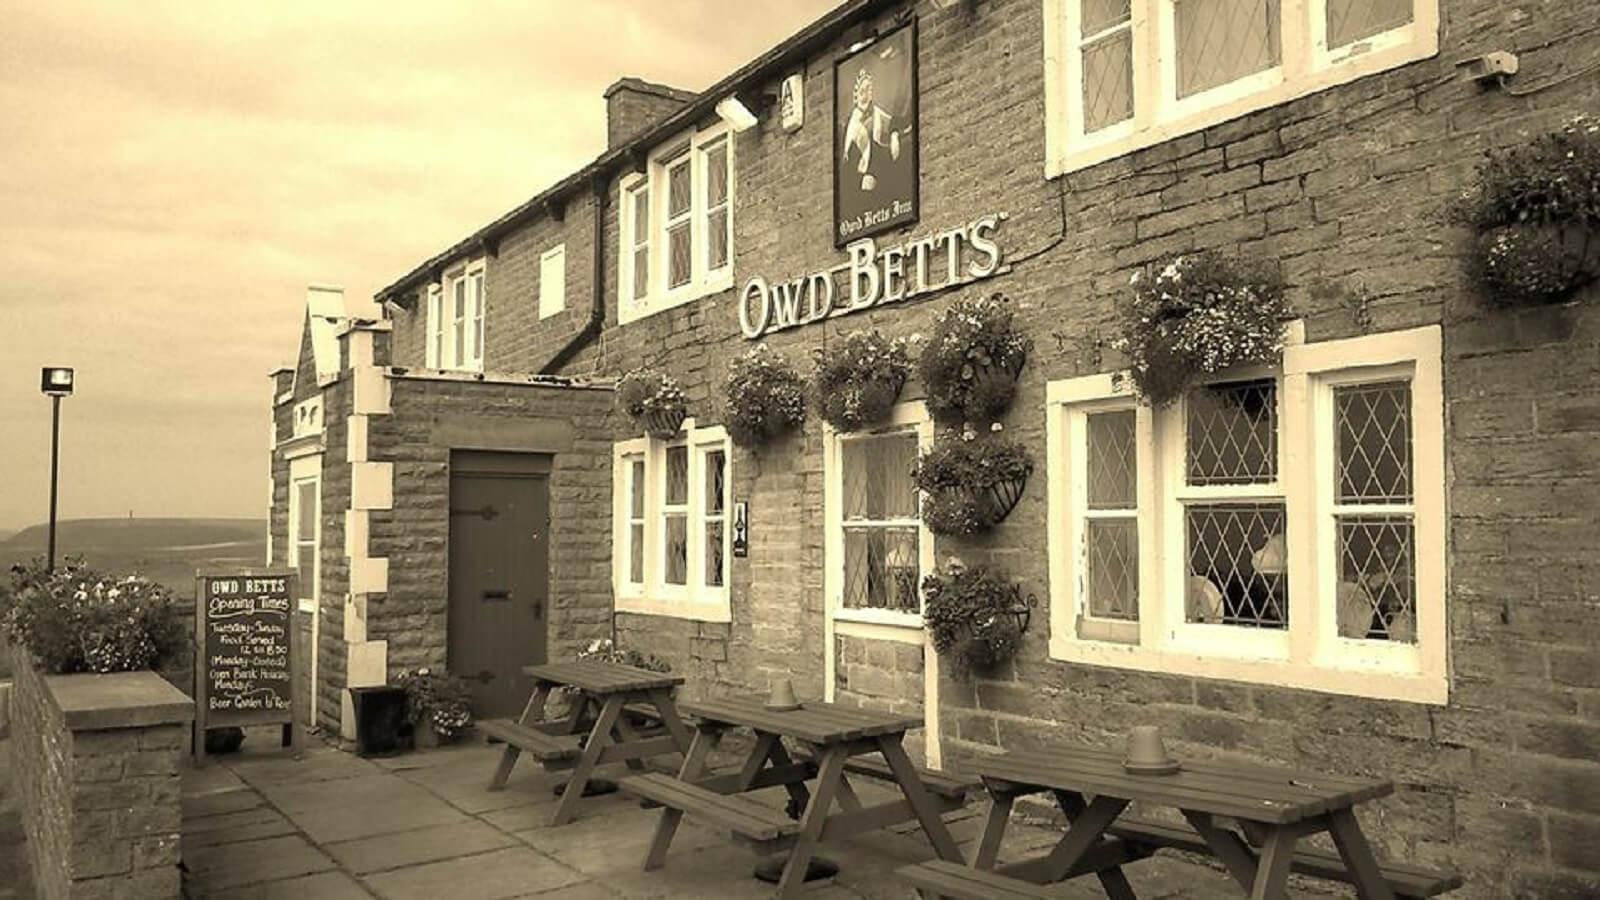 Owd Betts Country Inn